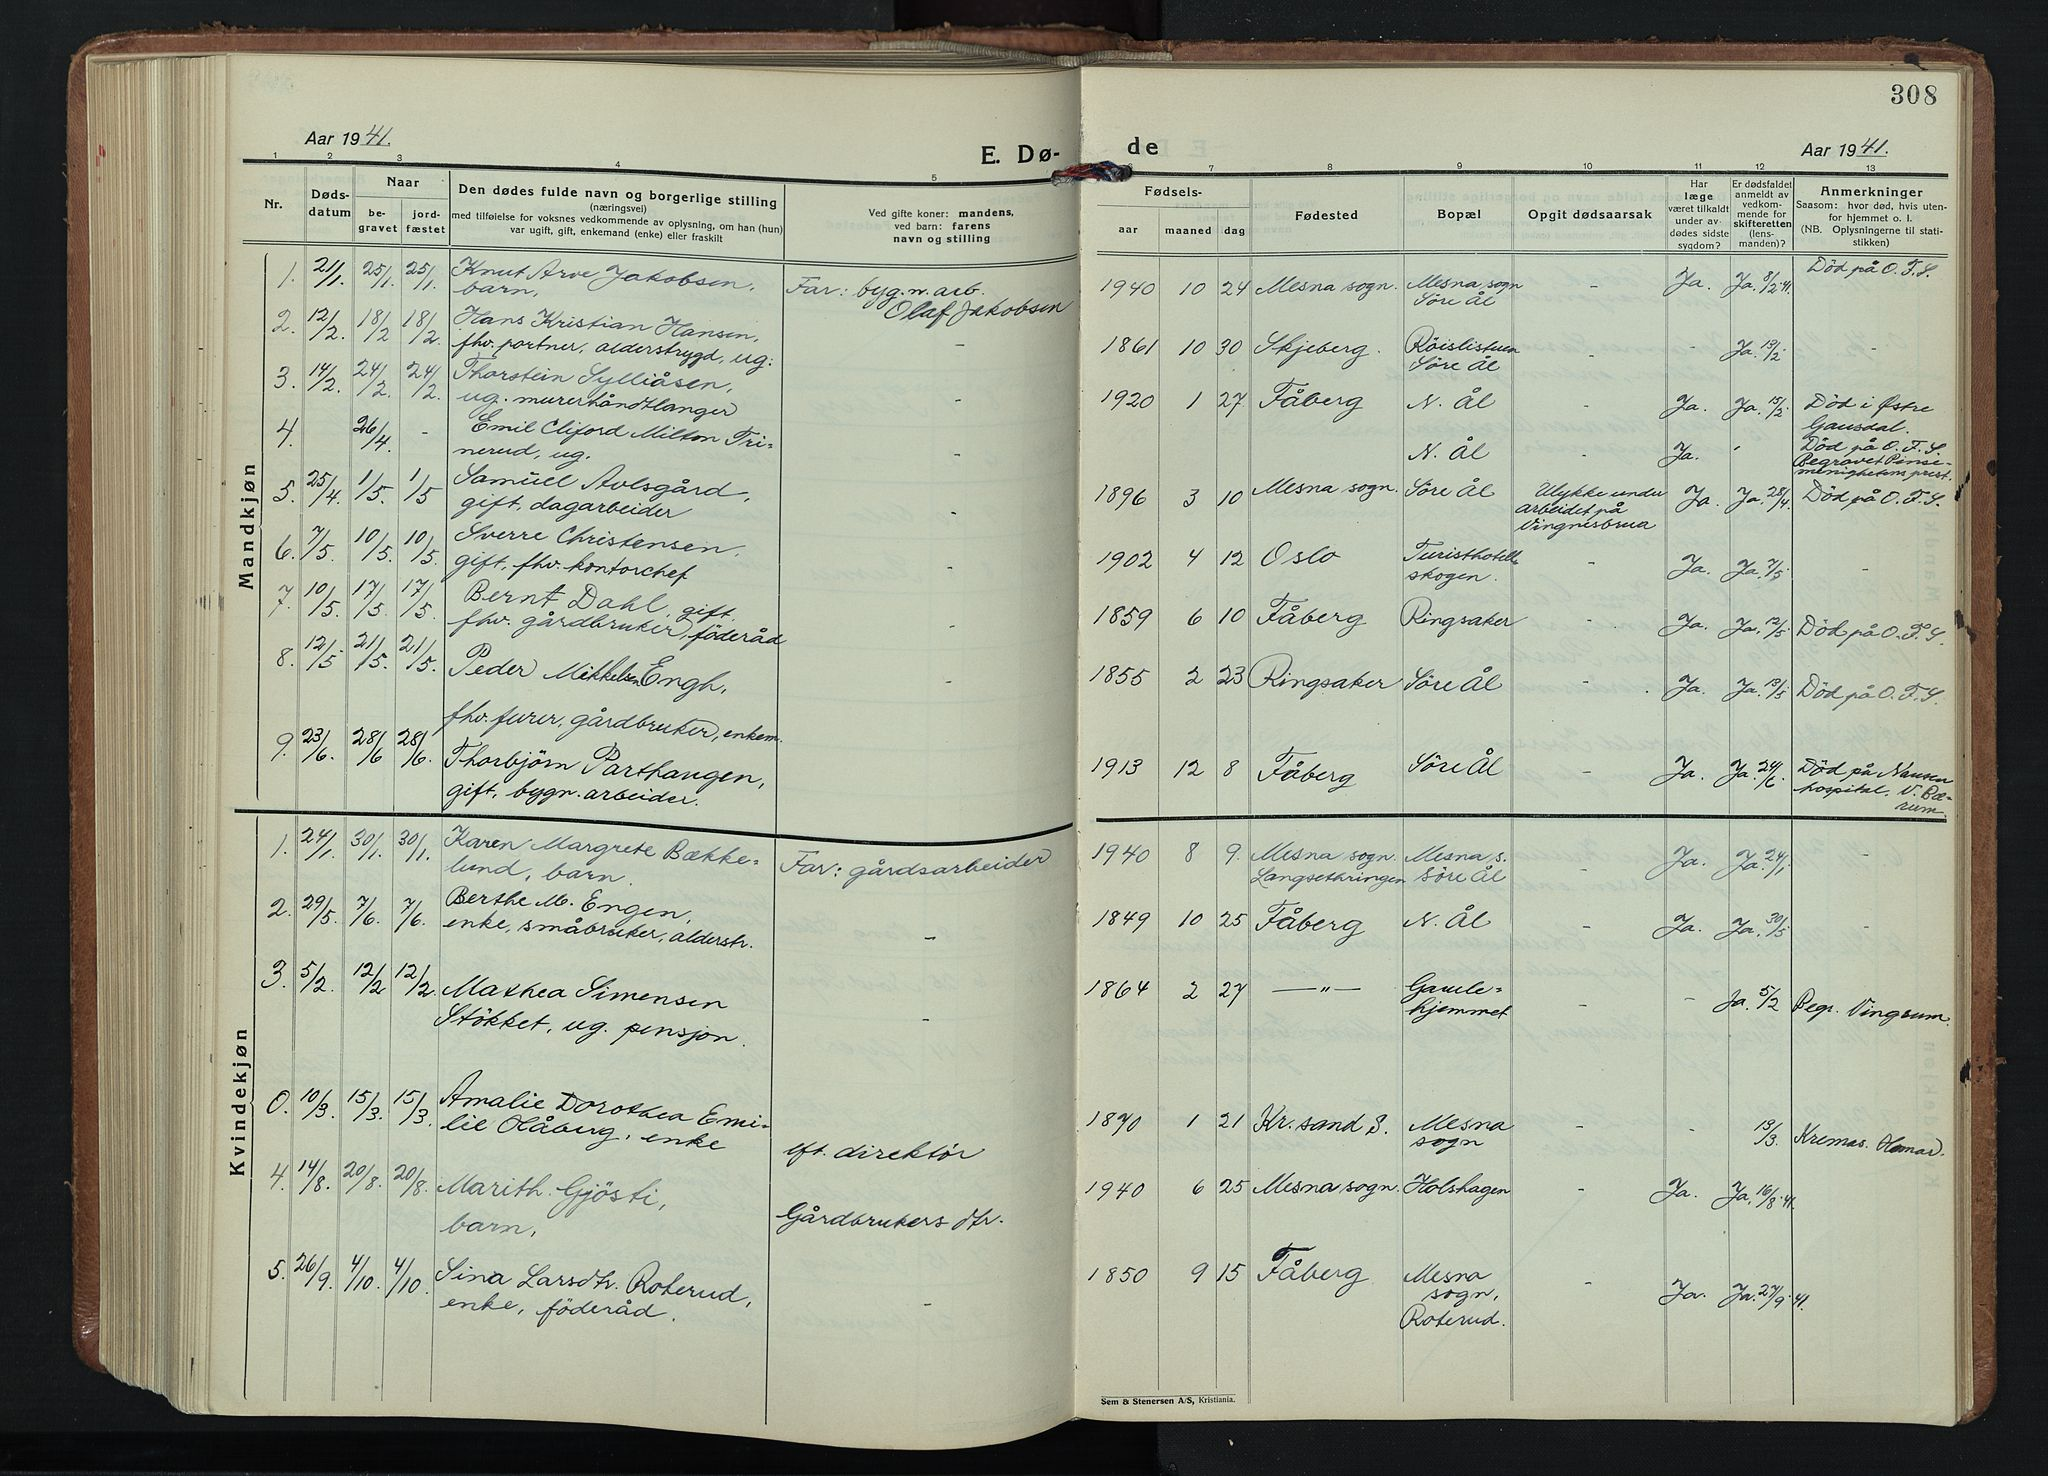 SAH, Fåberg prestekontor, Klokkerbok nr. 15, 1924-1949, s. 308